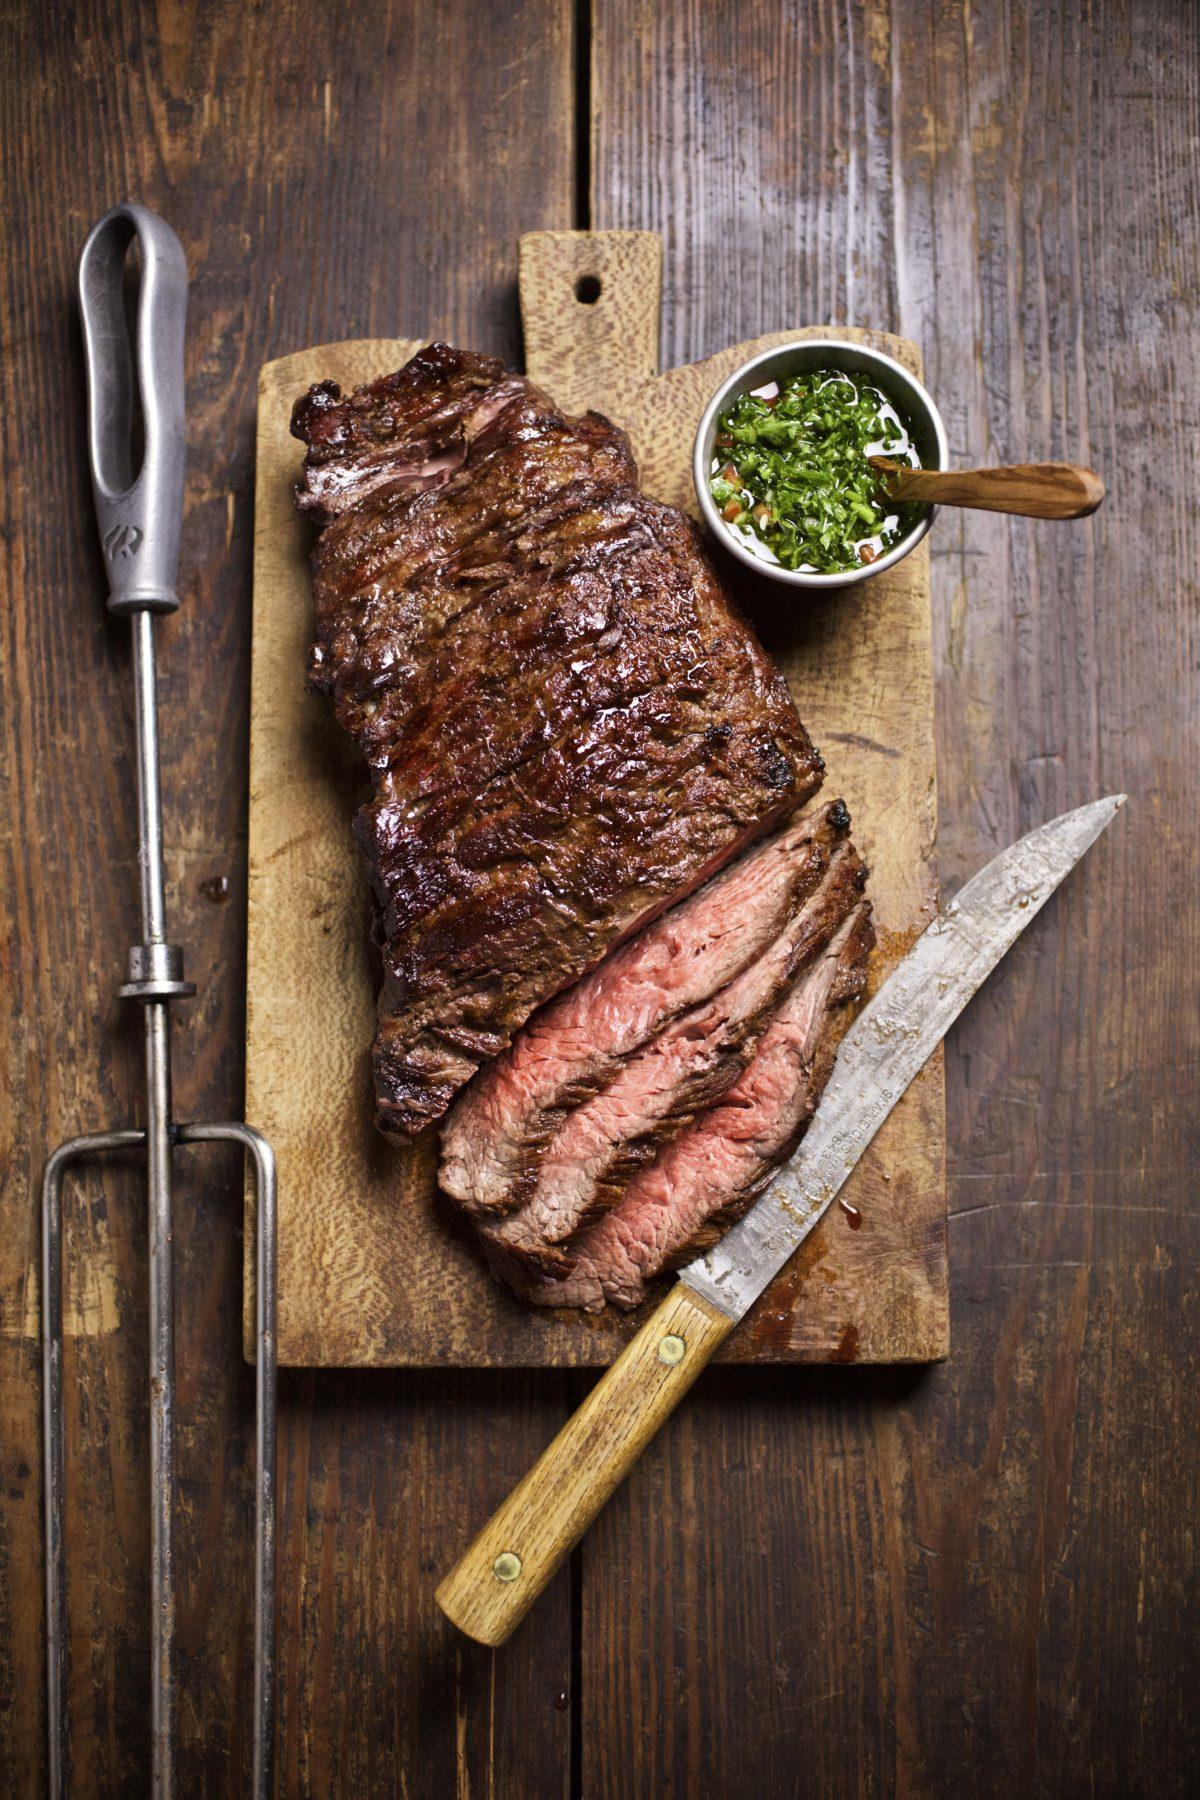 Meat Board New Launch Ladies Night Fogo de Chão in Dubai The Luxe Diary